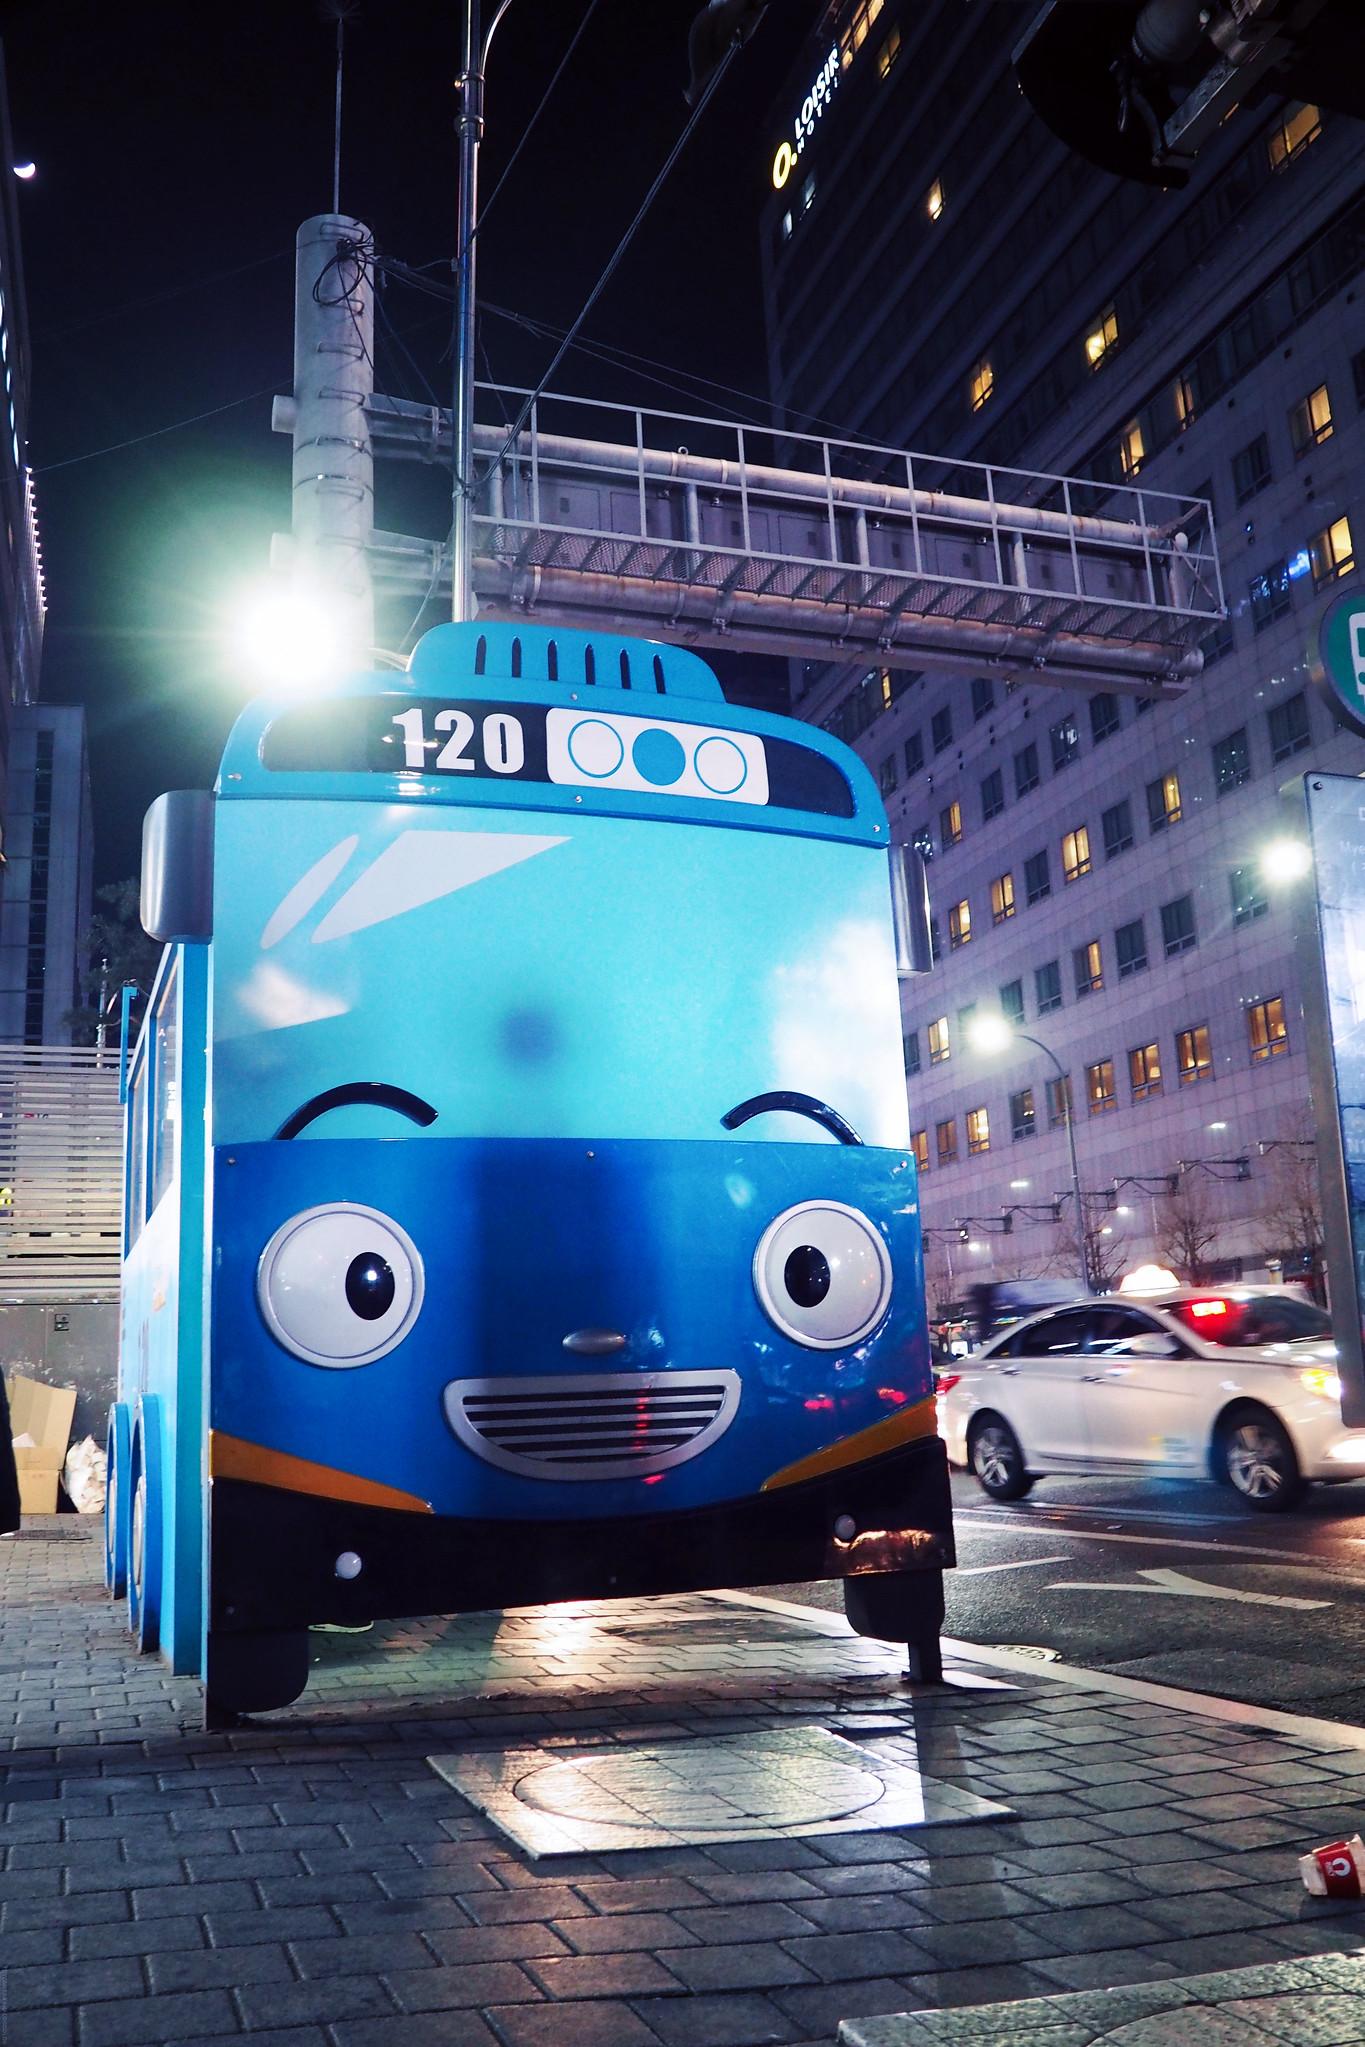 Bus Stop Cute Animated Toy Seoul South Korea